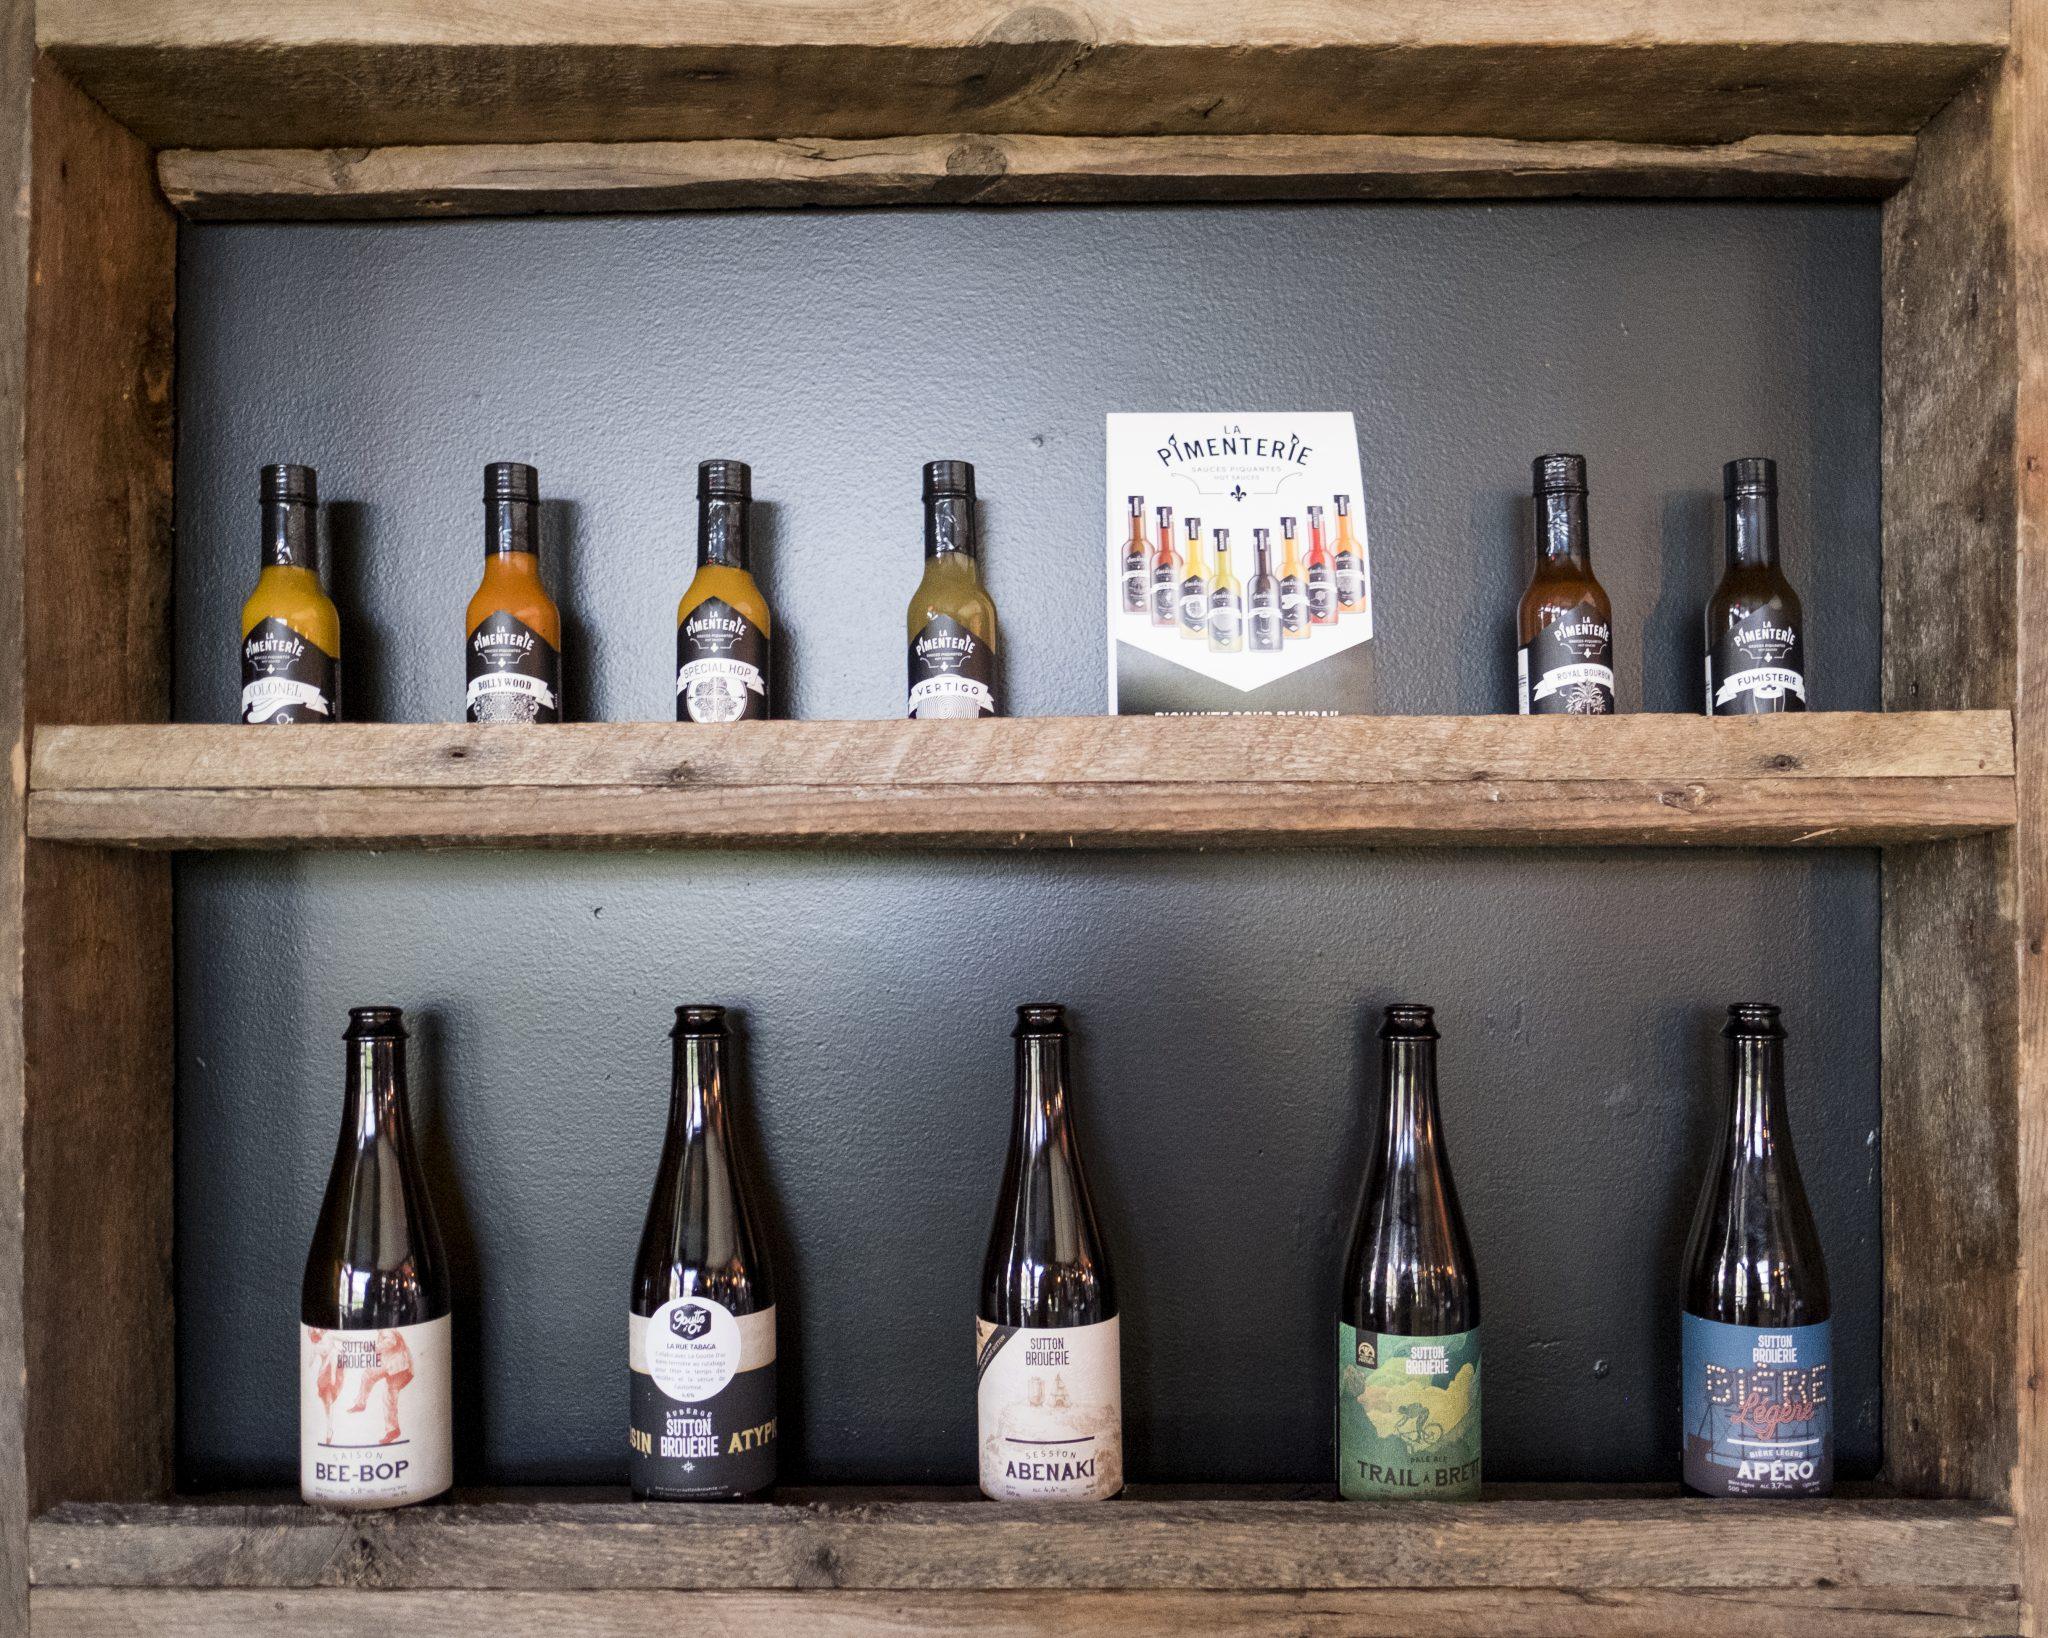 Bières IPA de Microbrasserie | Restaurant, auberge et microbrasserie située en Estrie | Auberge Sutton Brouërie